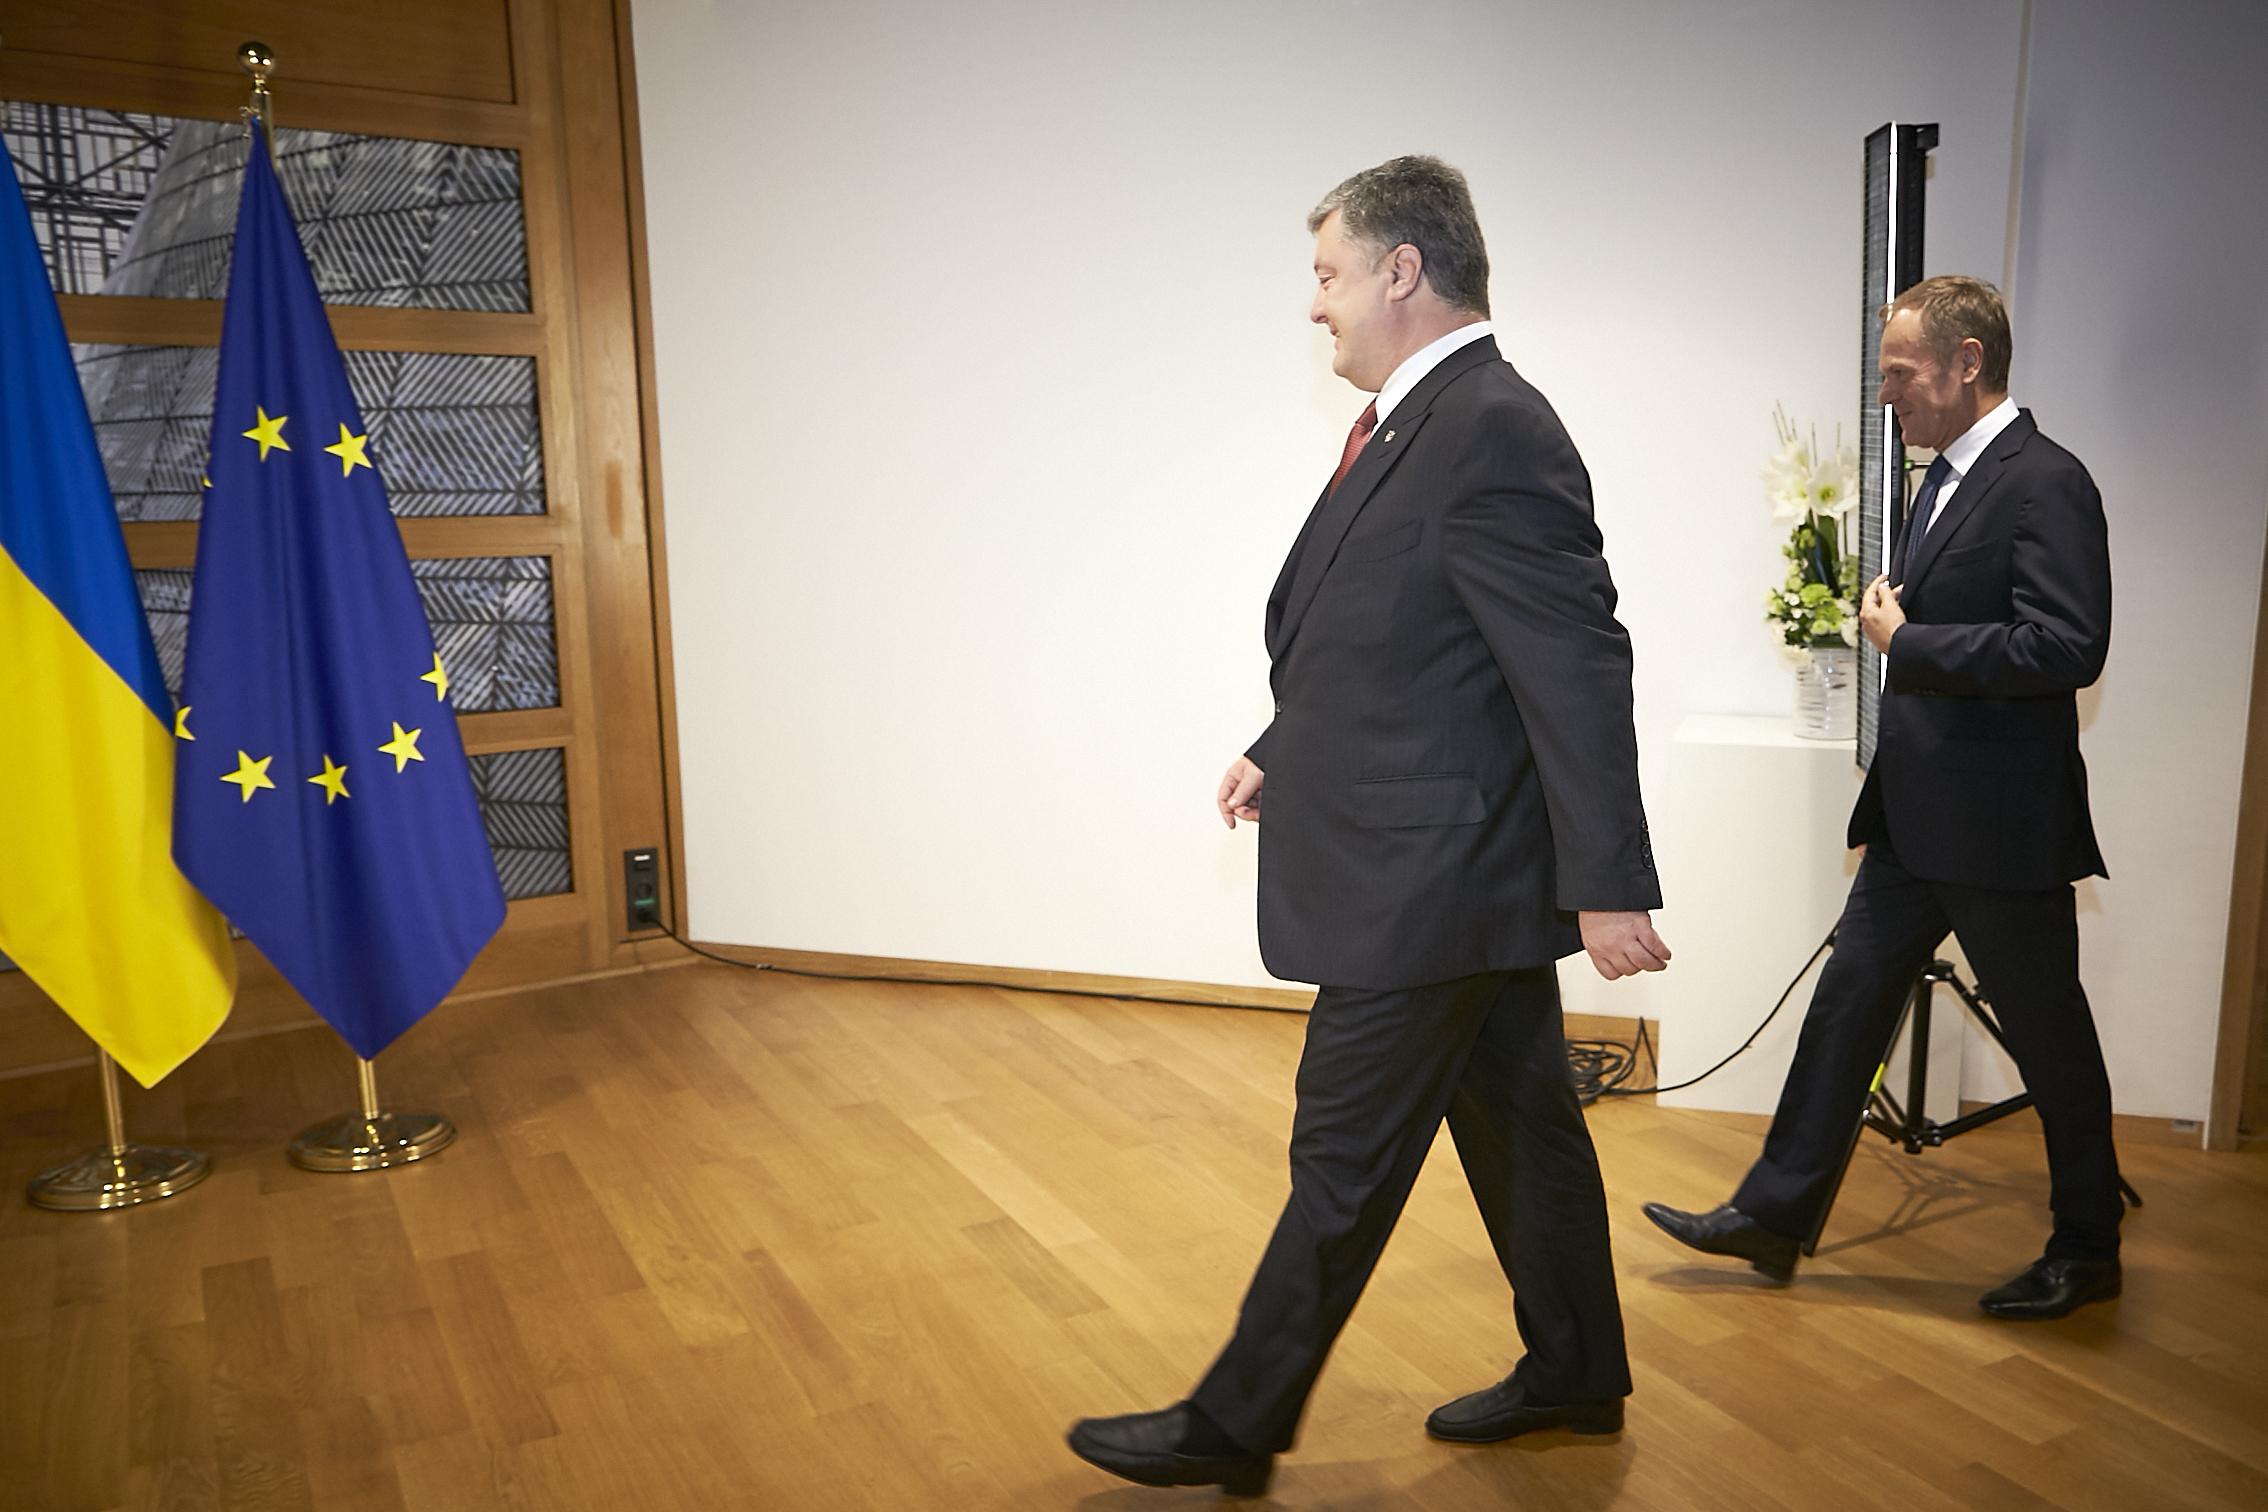 EU, ex-Soviet states push ties in face of 'hostile' Russian Federation